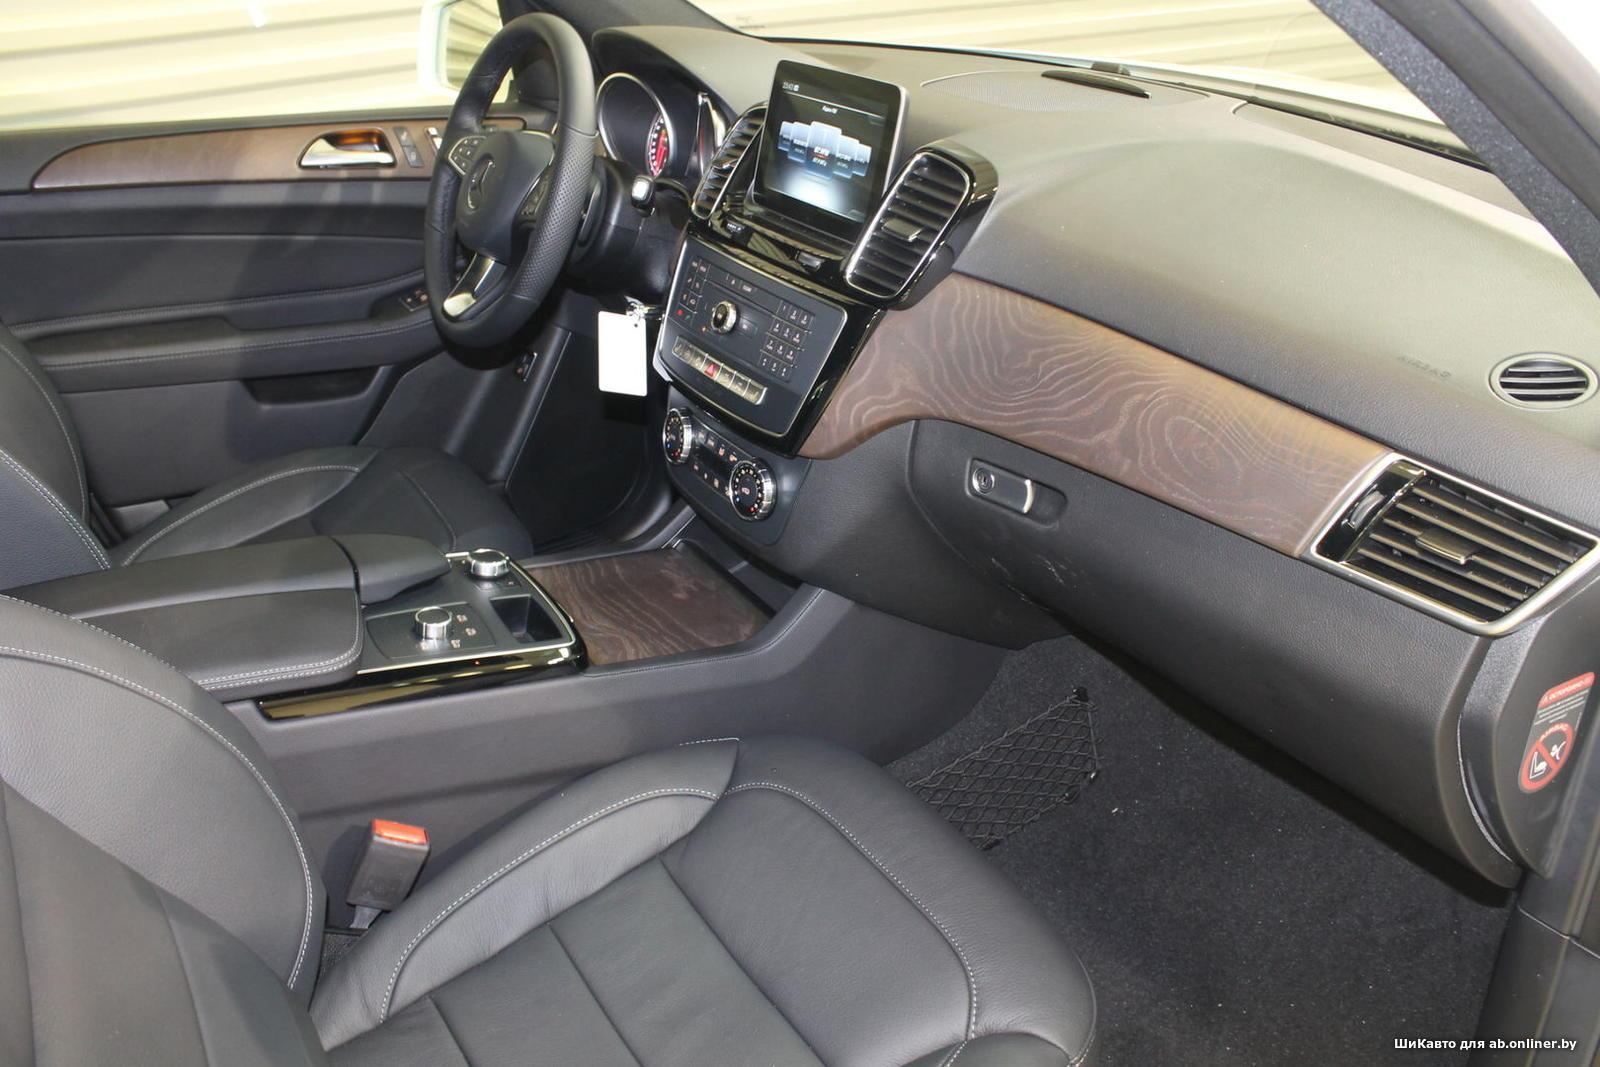 Mercedes GLE250 d 4MATIC Особая сери